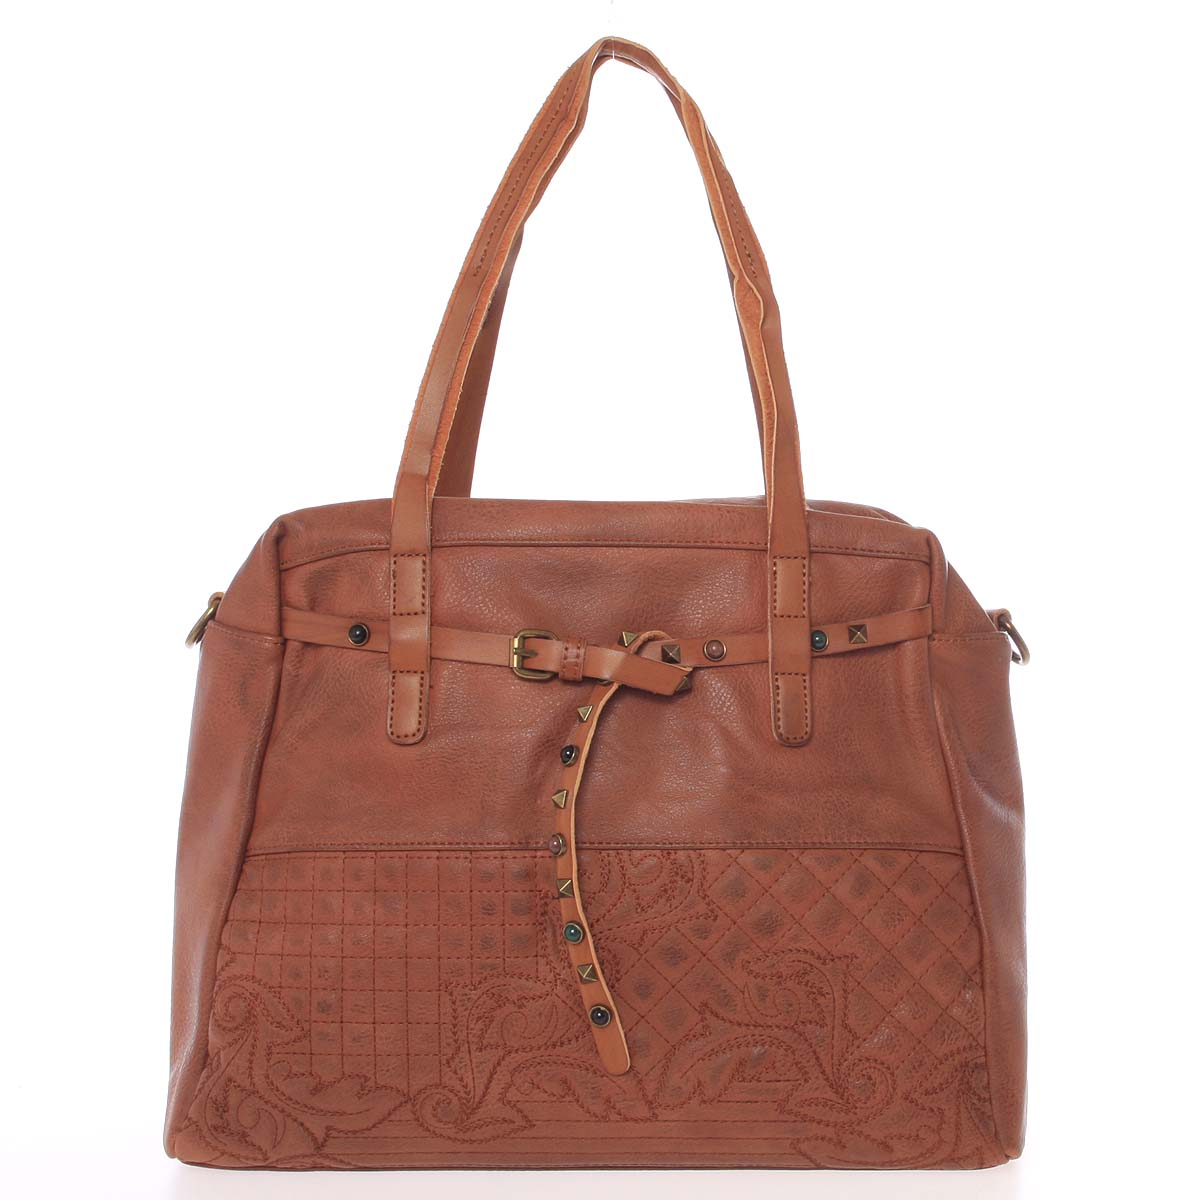 Jedinečná dámska kabelka hnedá - MARIA C Jocelynn hnedá